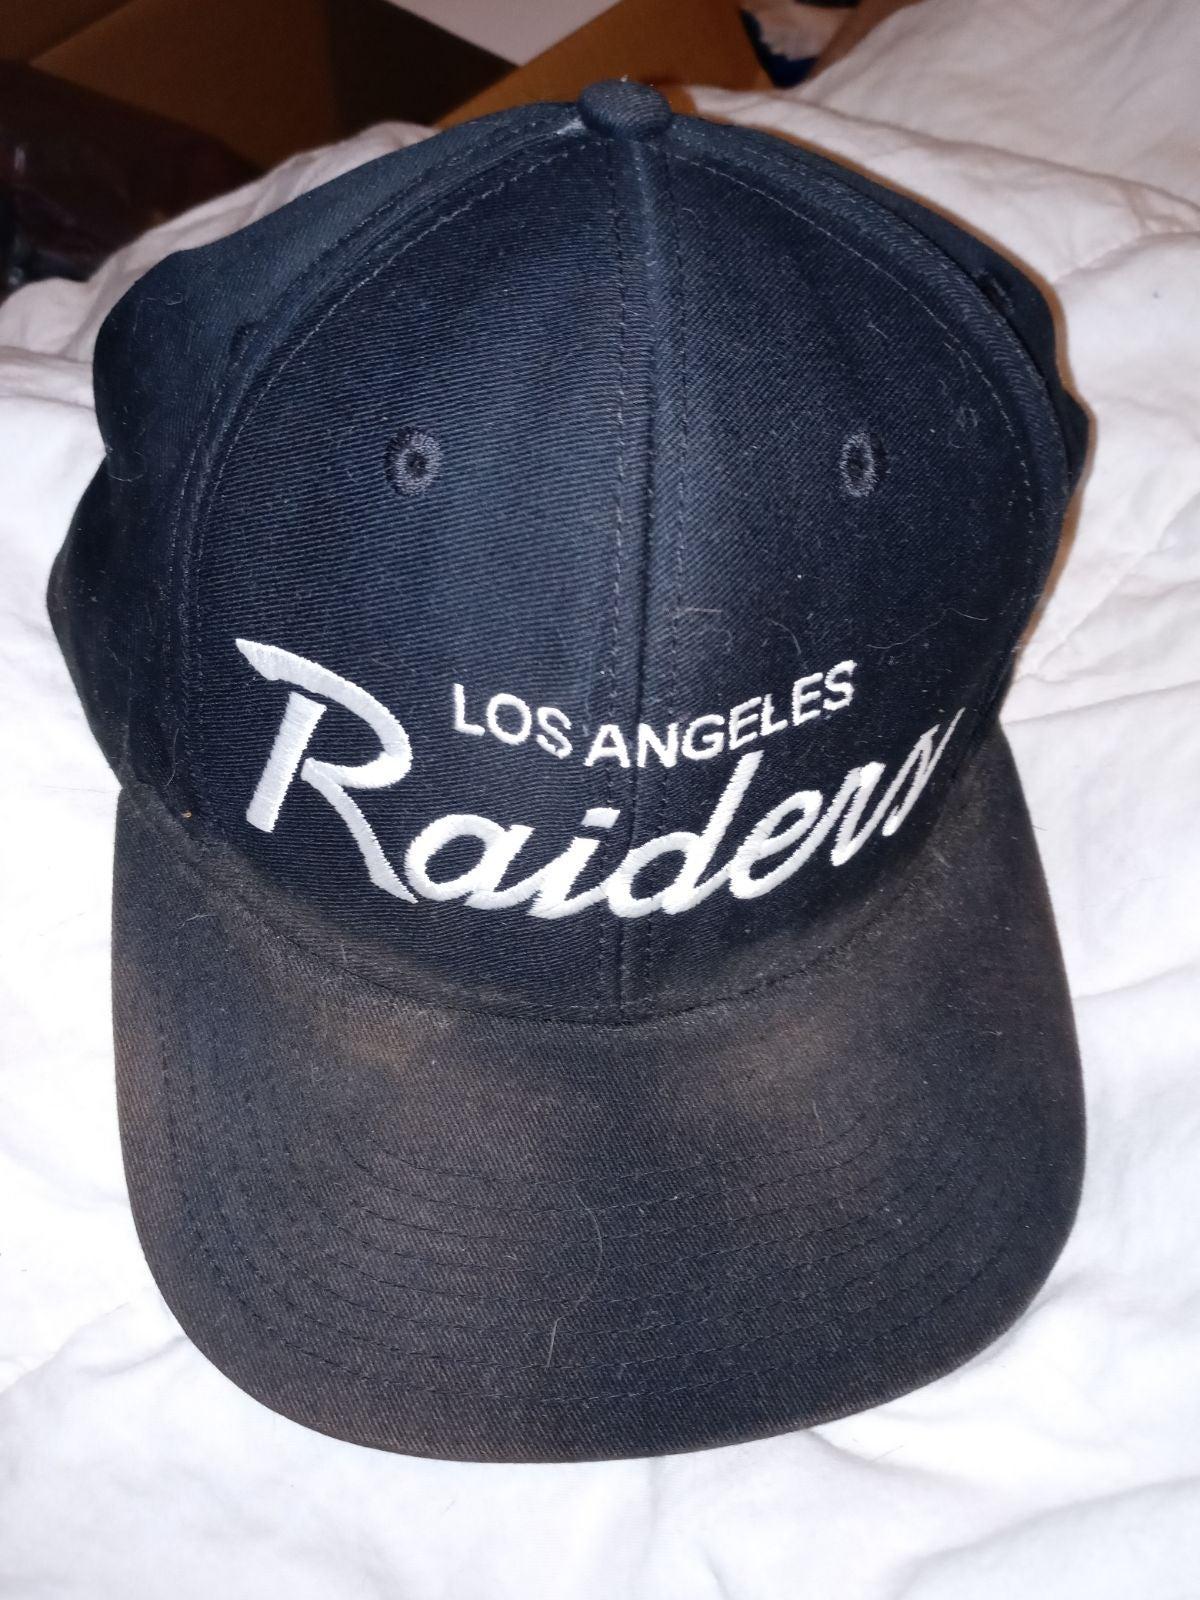 Los Angeles Raiders cap